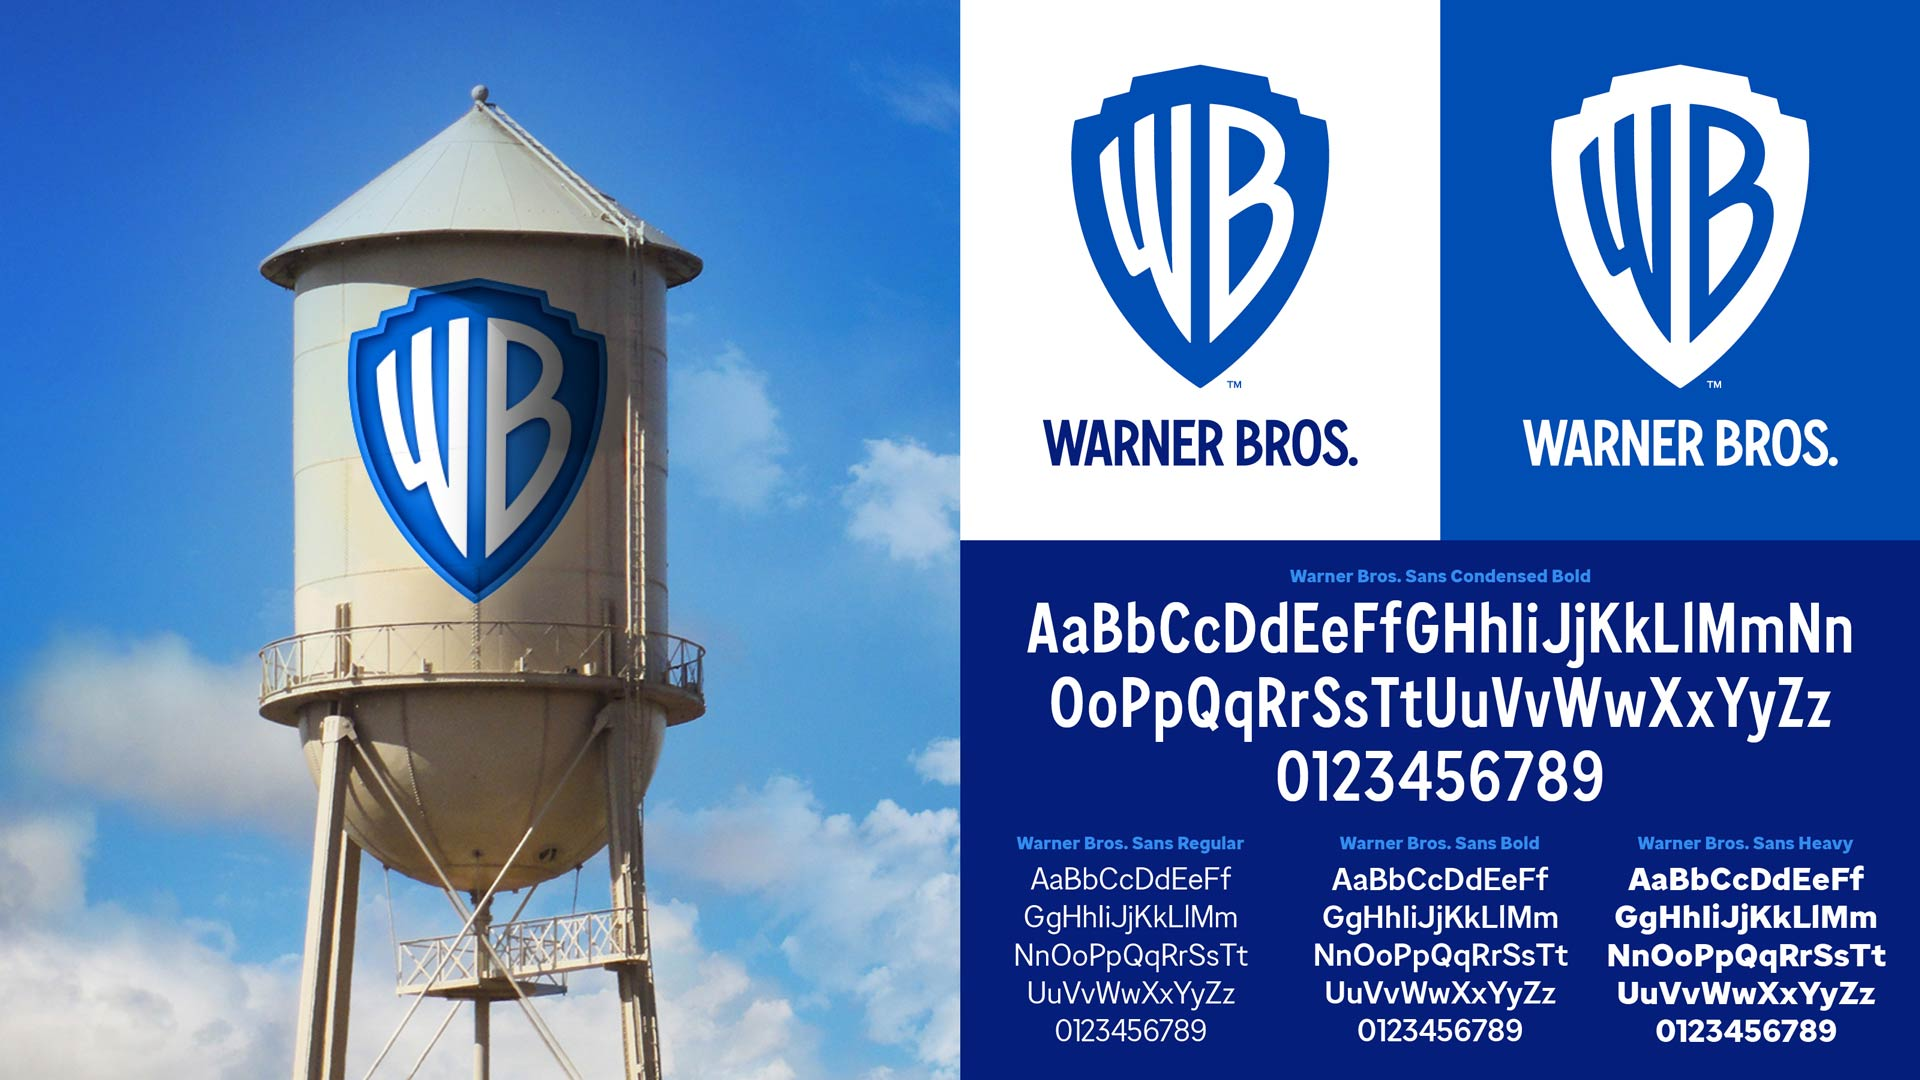 warner bros logo and typeface